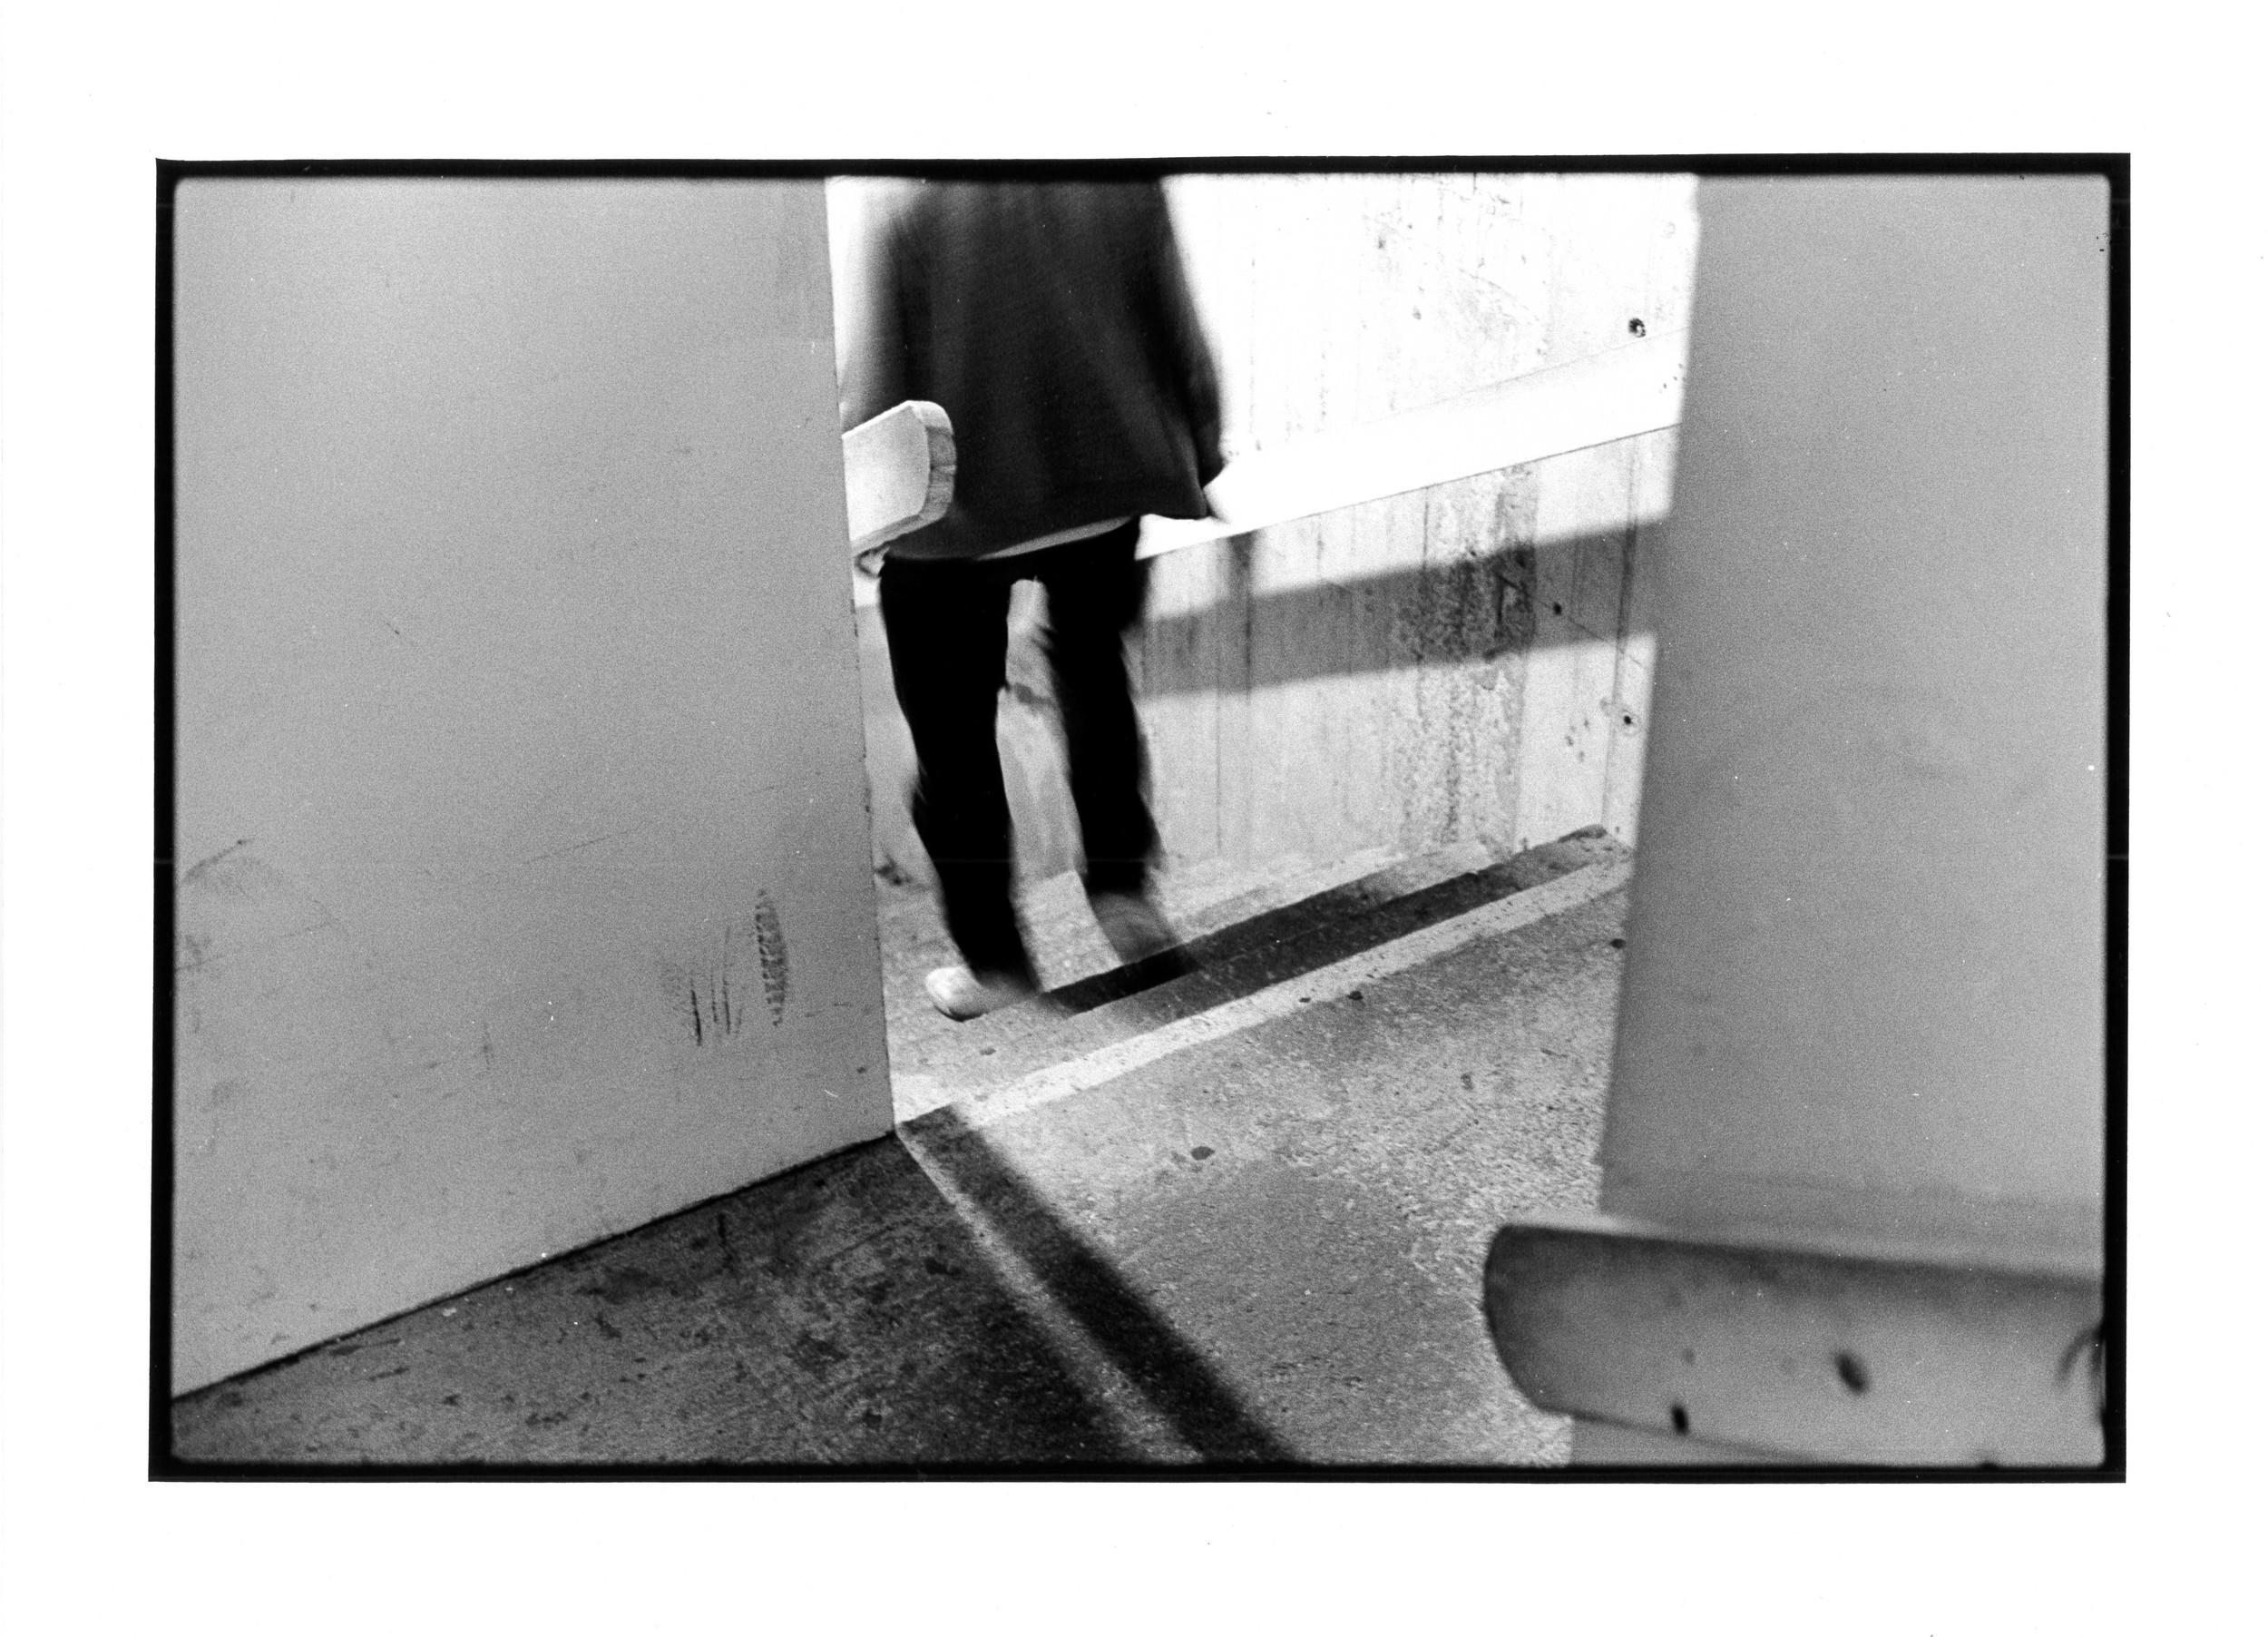 Silhouette, Bruxelles 2012 24x36 cm